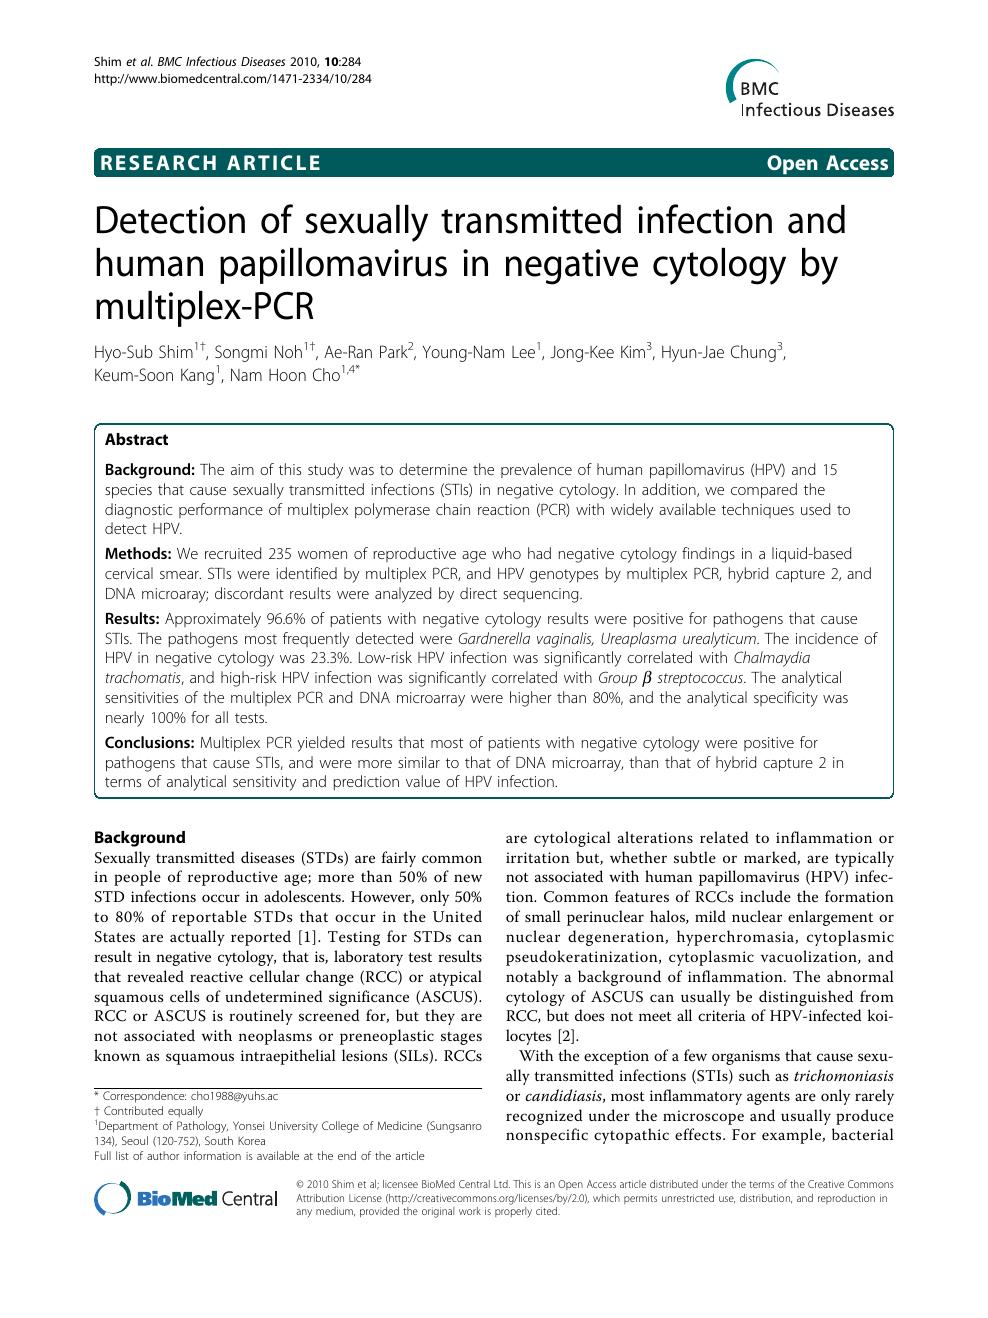 Papillomavirus est il transmissible a lhomme